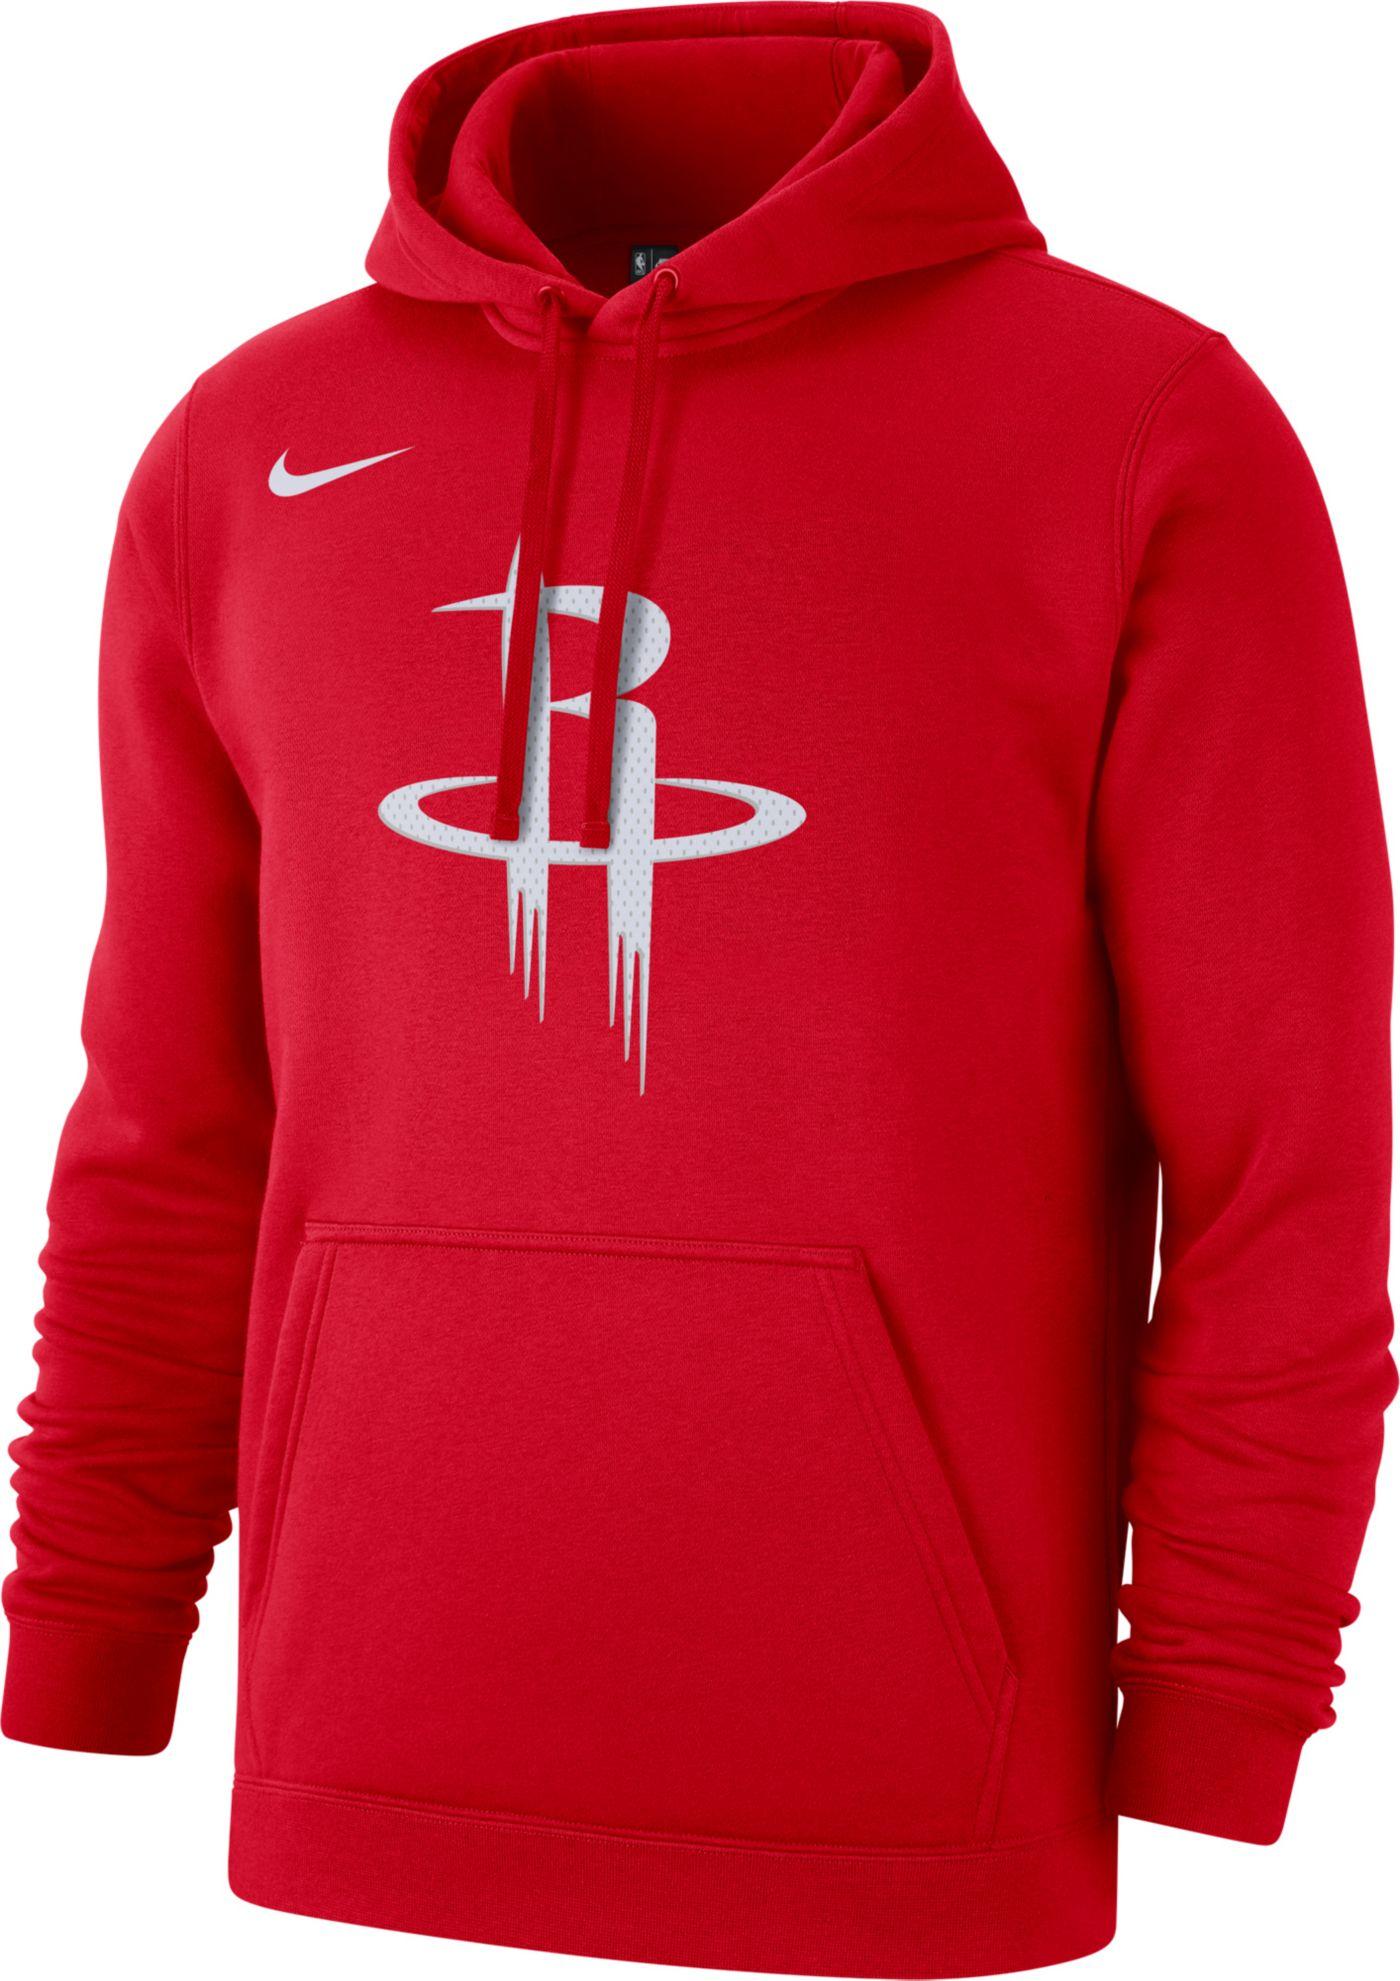 Nike Men's Houston Rockets Pullover Hoodie